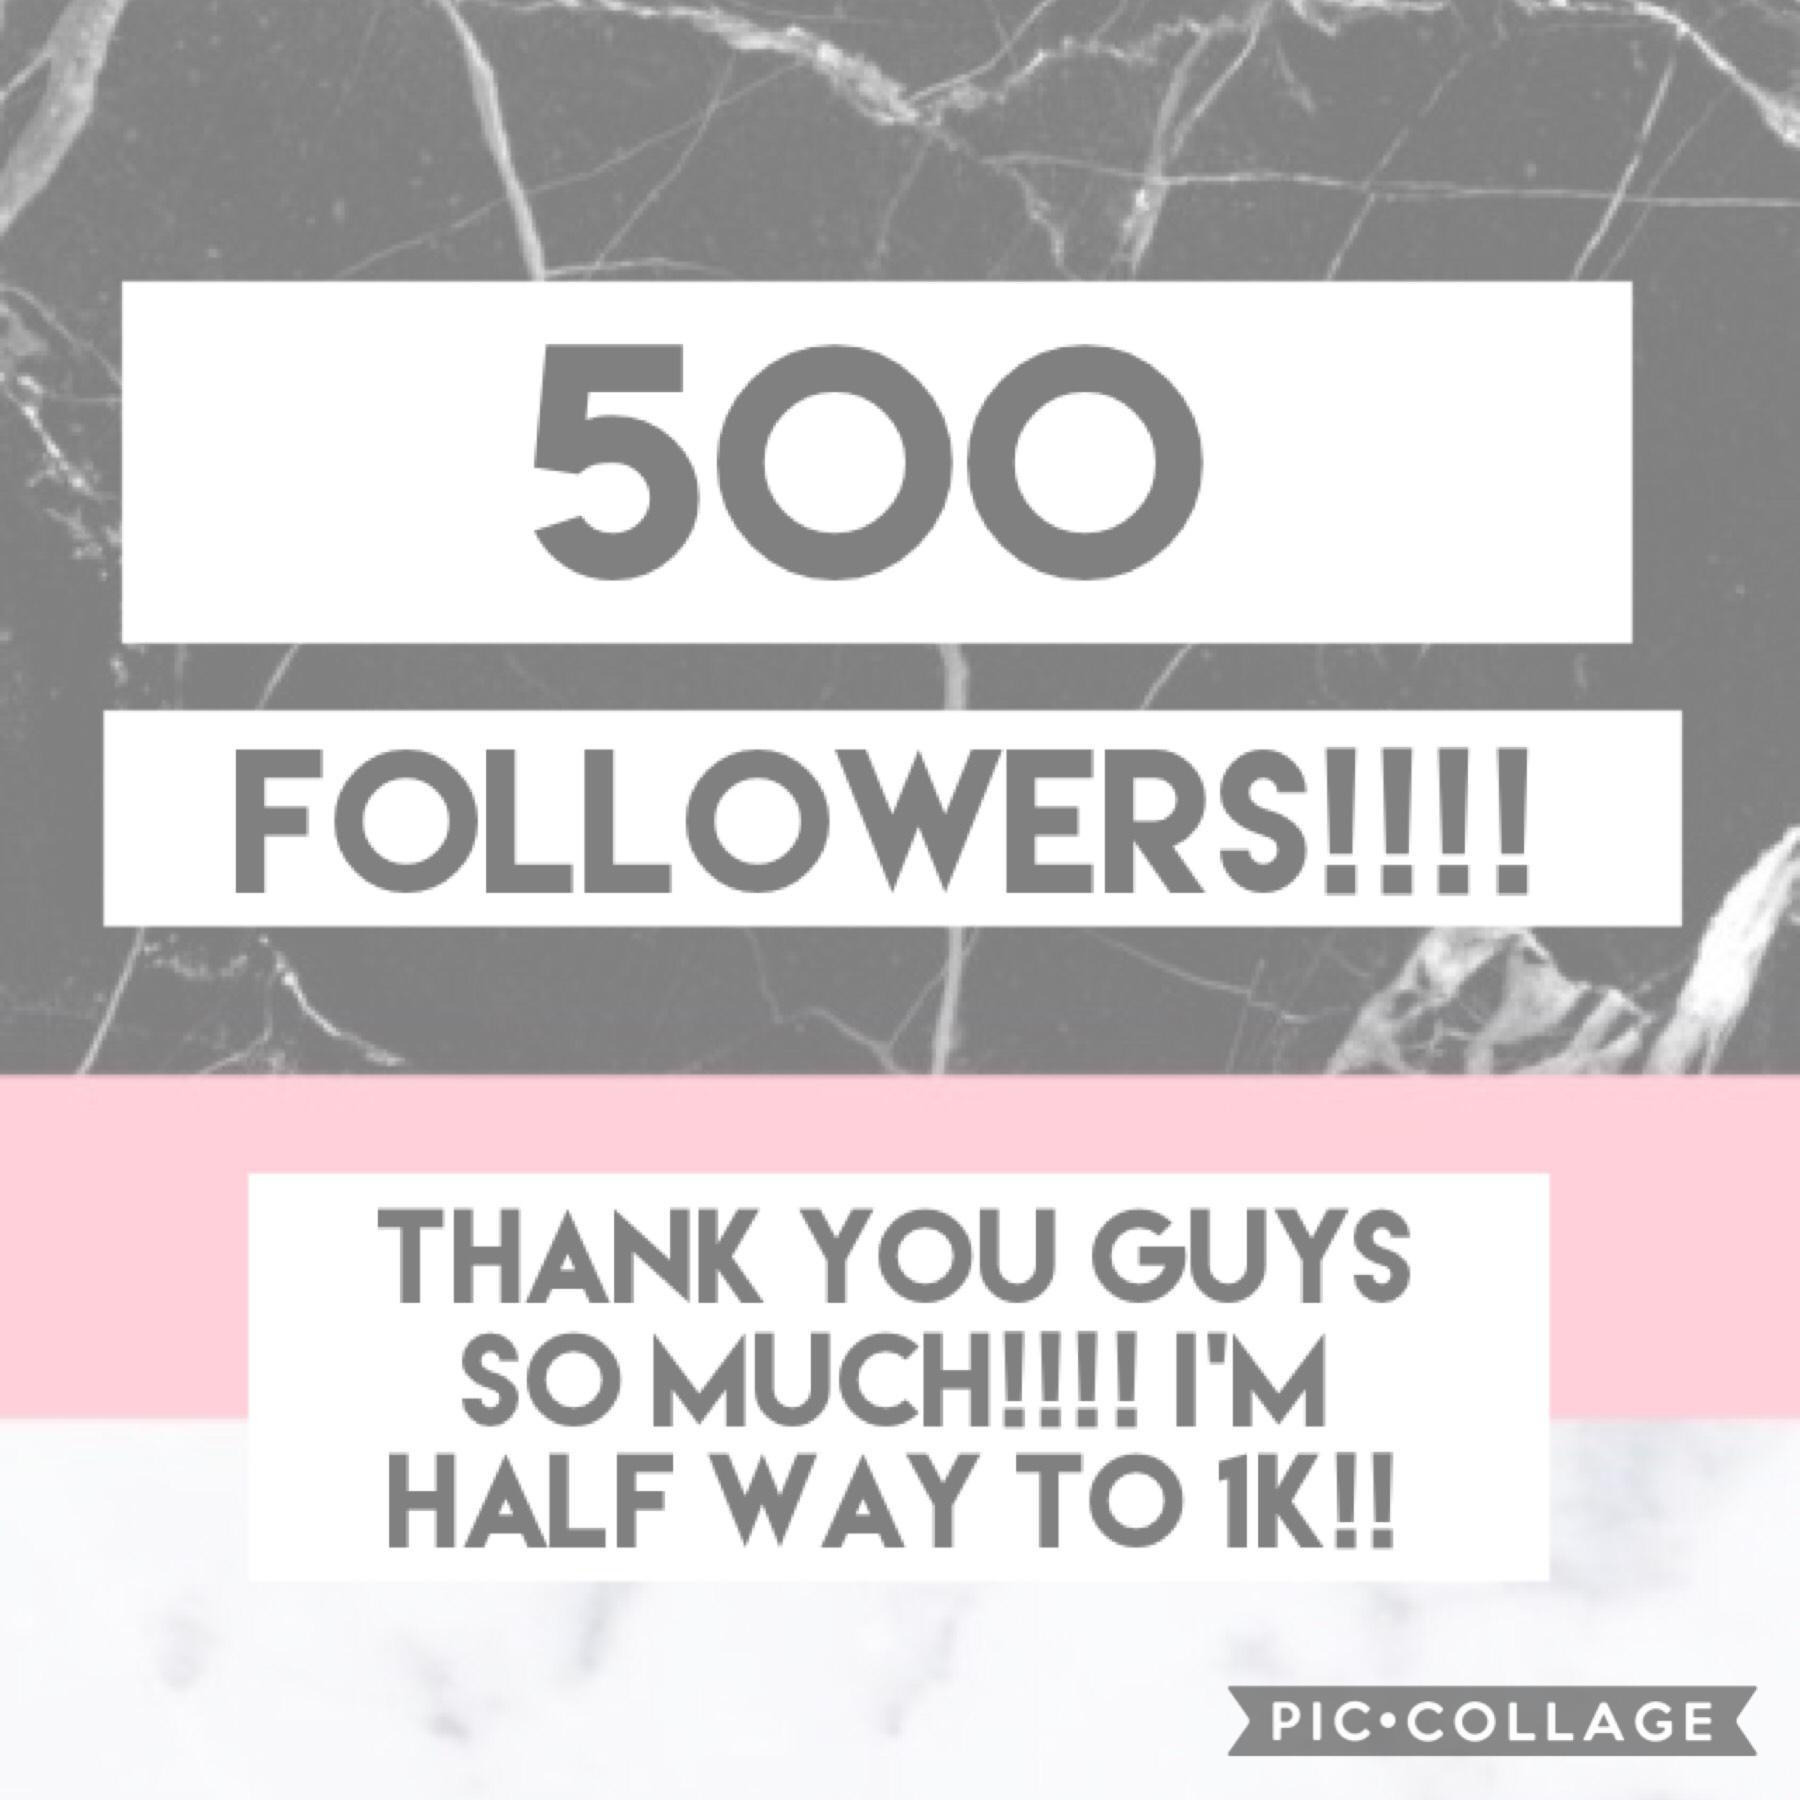 Thanks so much guys!!!